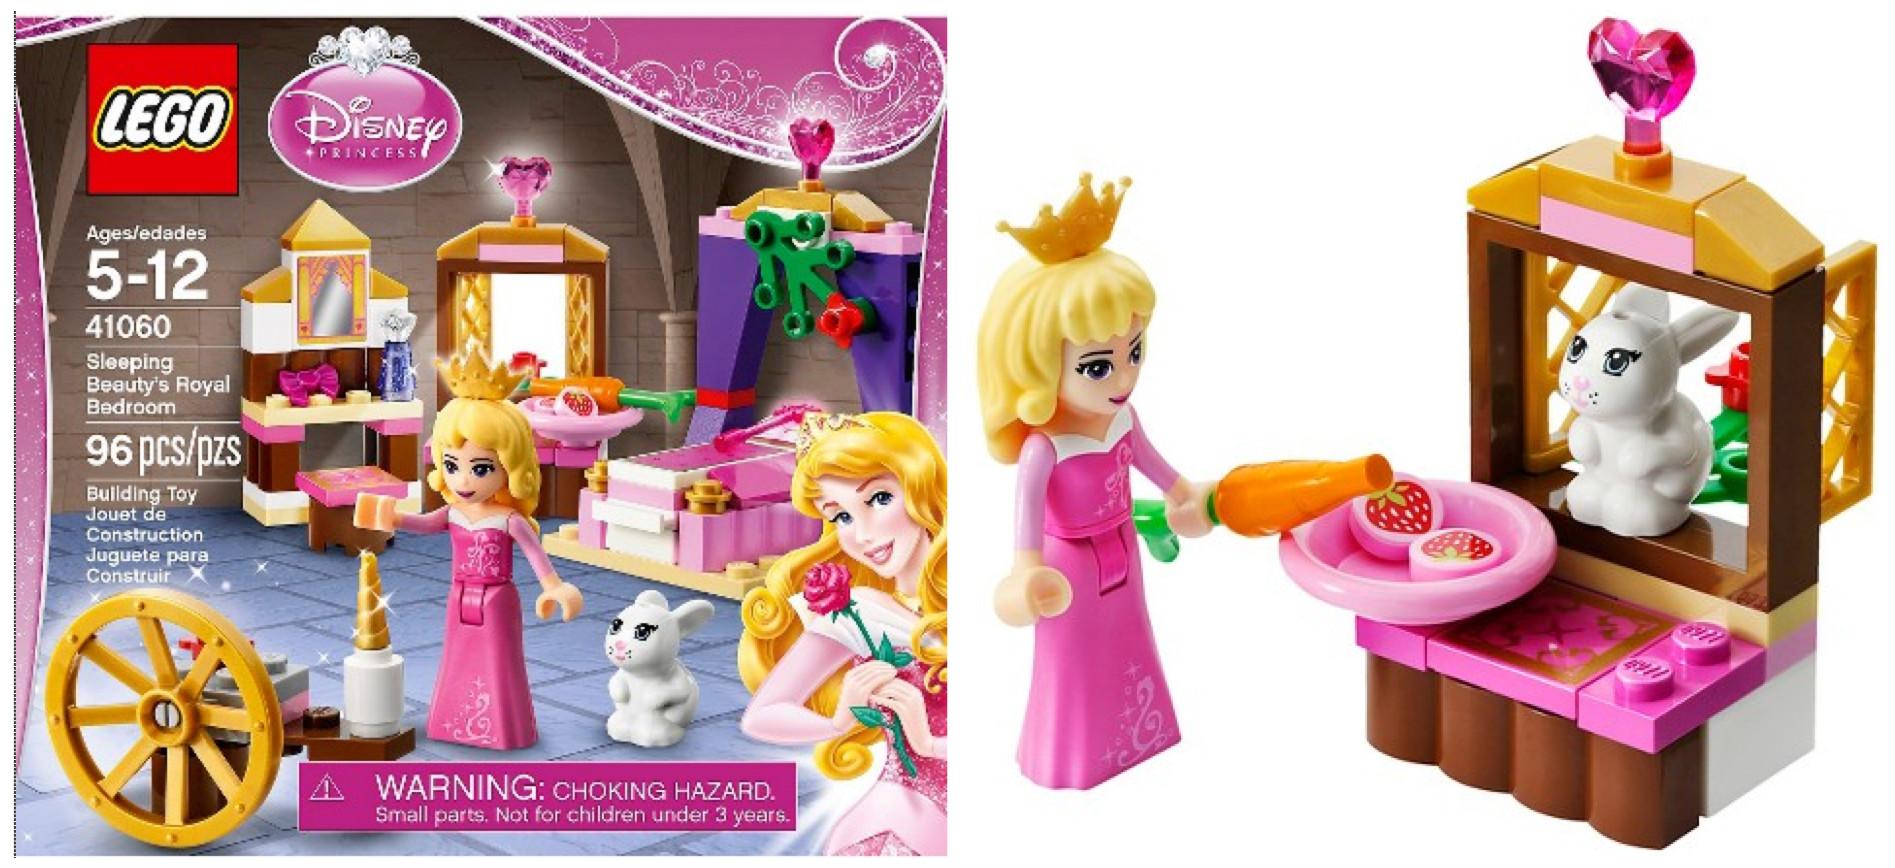 Target Lego Disney Princess Sleeping Beauty S Royal Bedroom Set Only 9 08 Shipped Hip2save